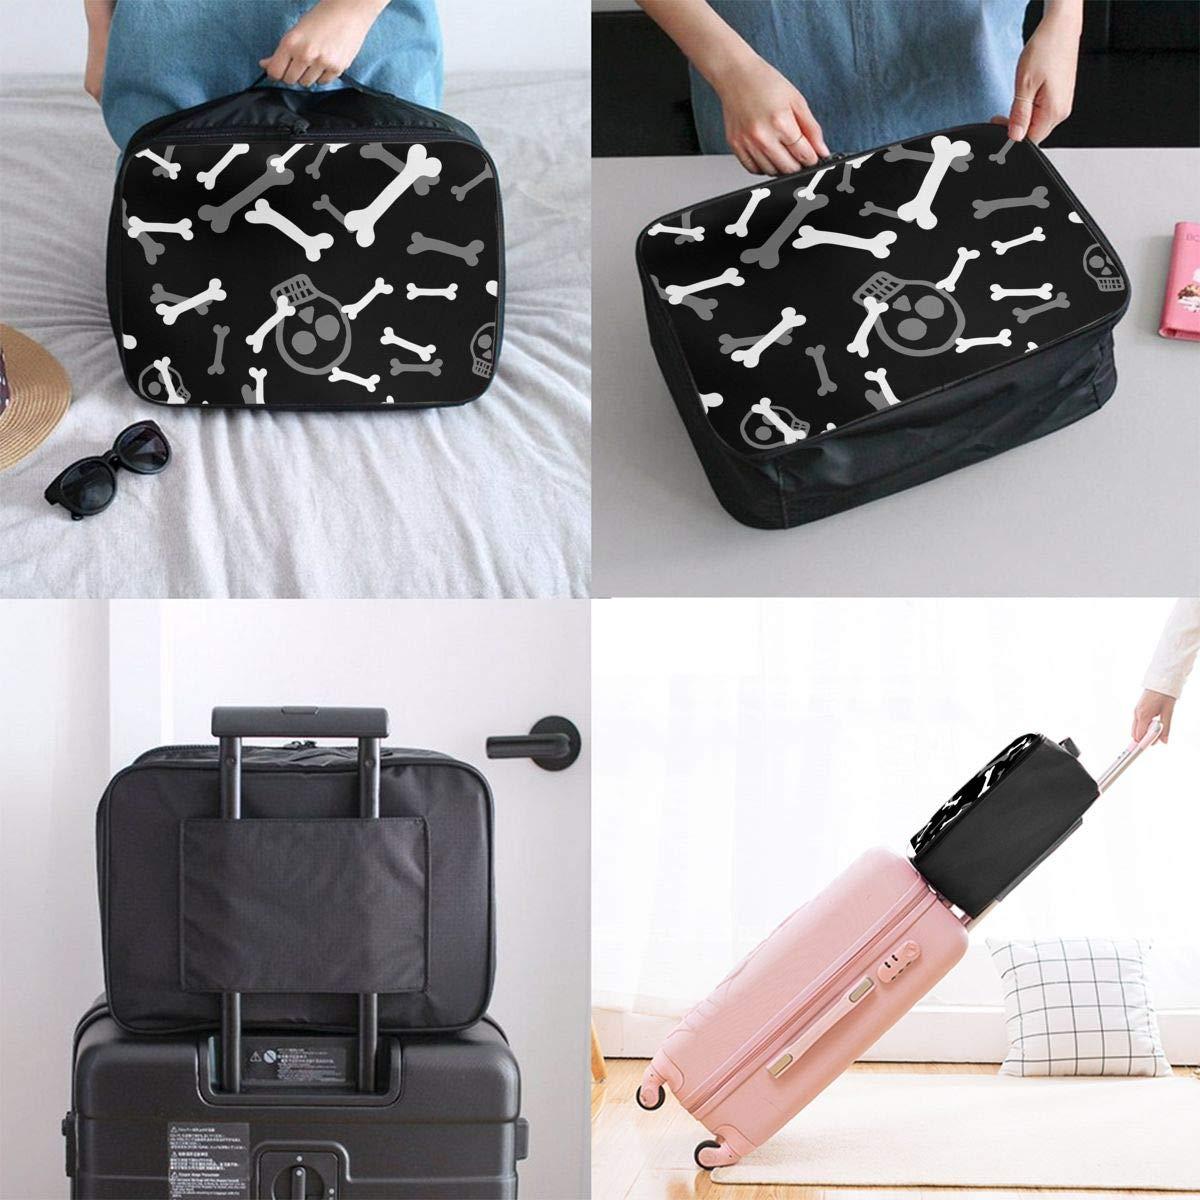 ADGAI Bones and Skulls Canvas Travel Weekender Bag,Fashion Custom Lightweight Large Capacity Portable Luggage Bag,Suitcase Trolley Bag